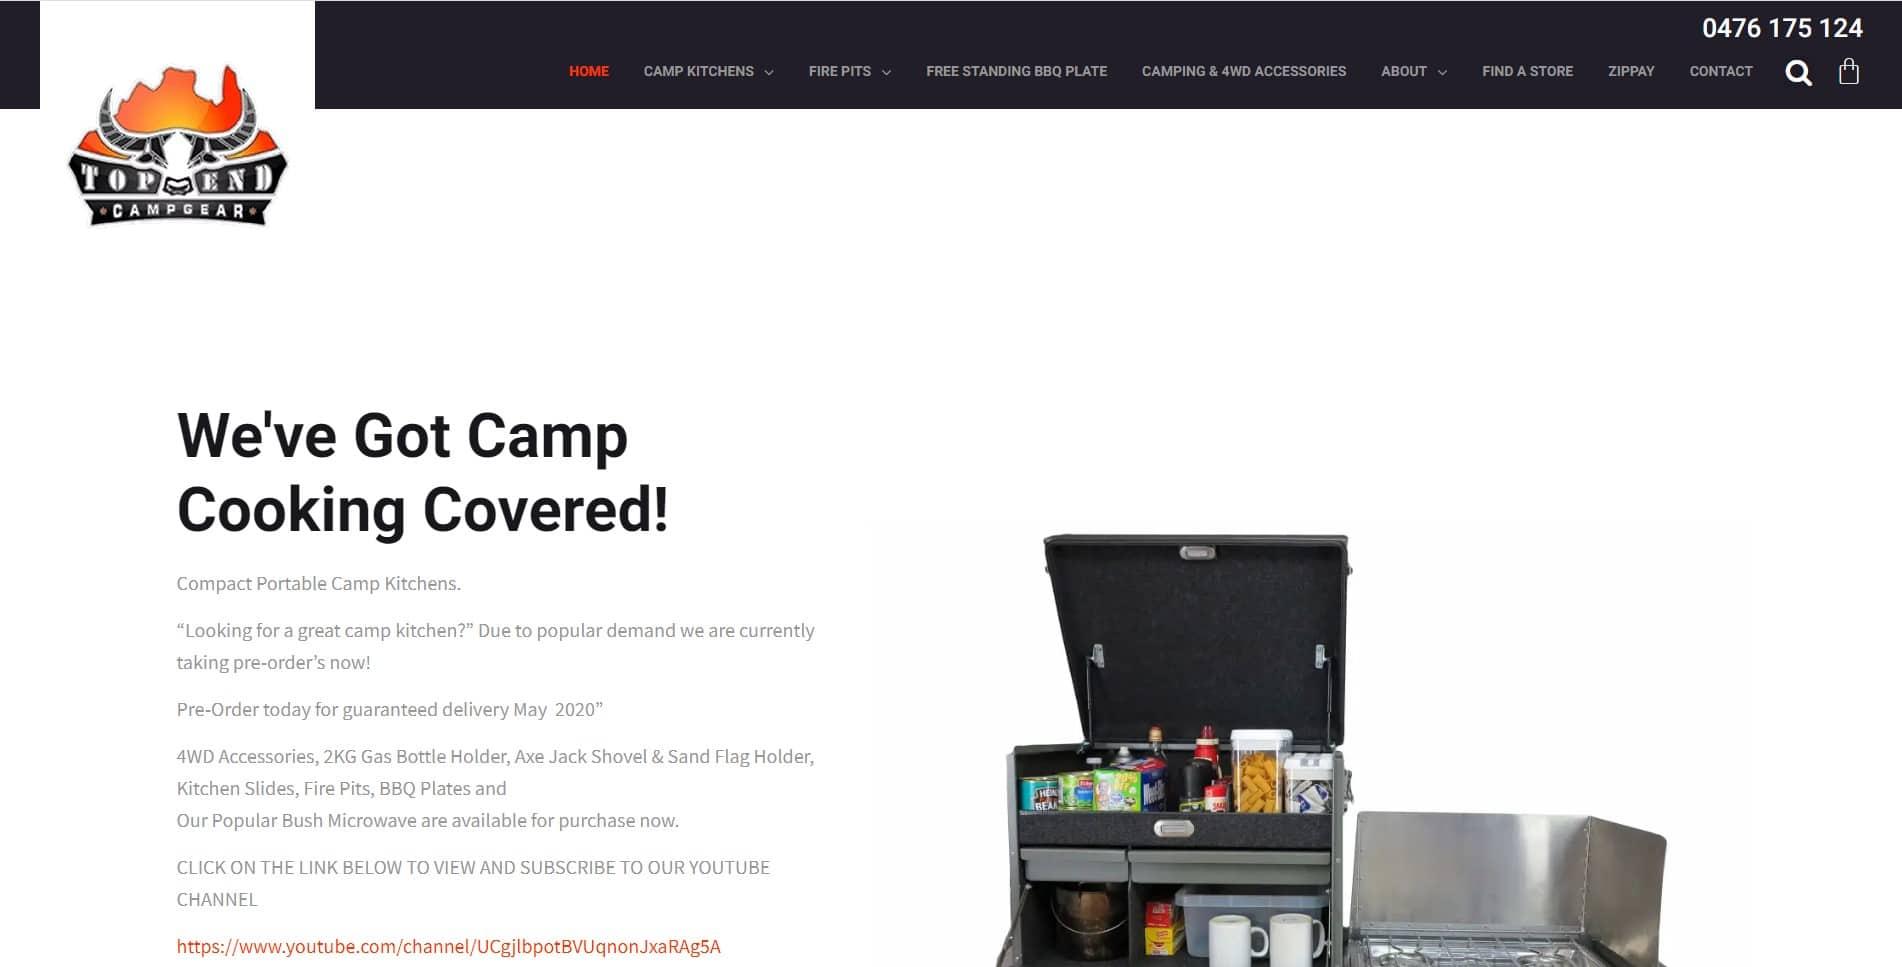 Top End Campgear Website Design & SEO Northern Rivers NSW - JezNorthWeb